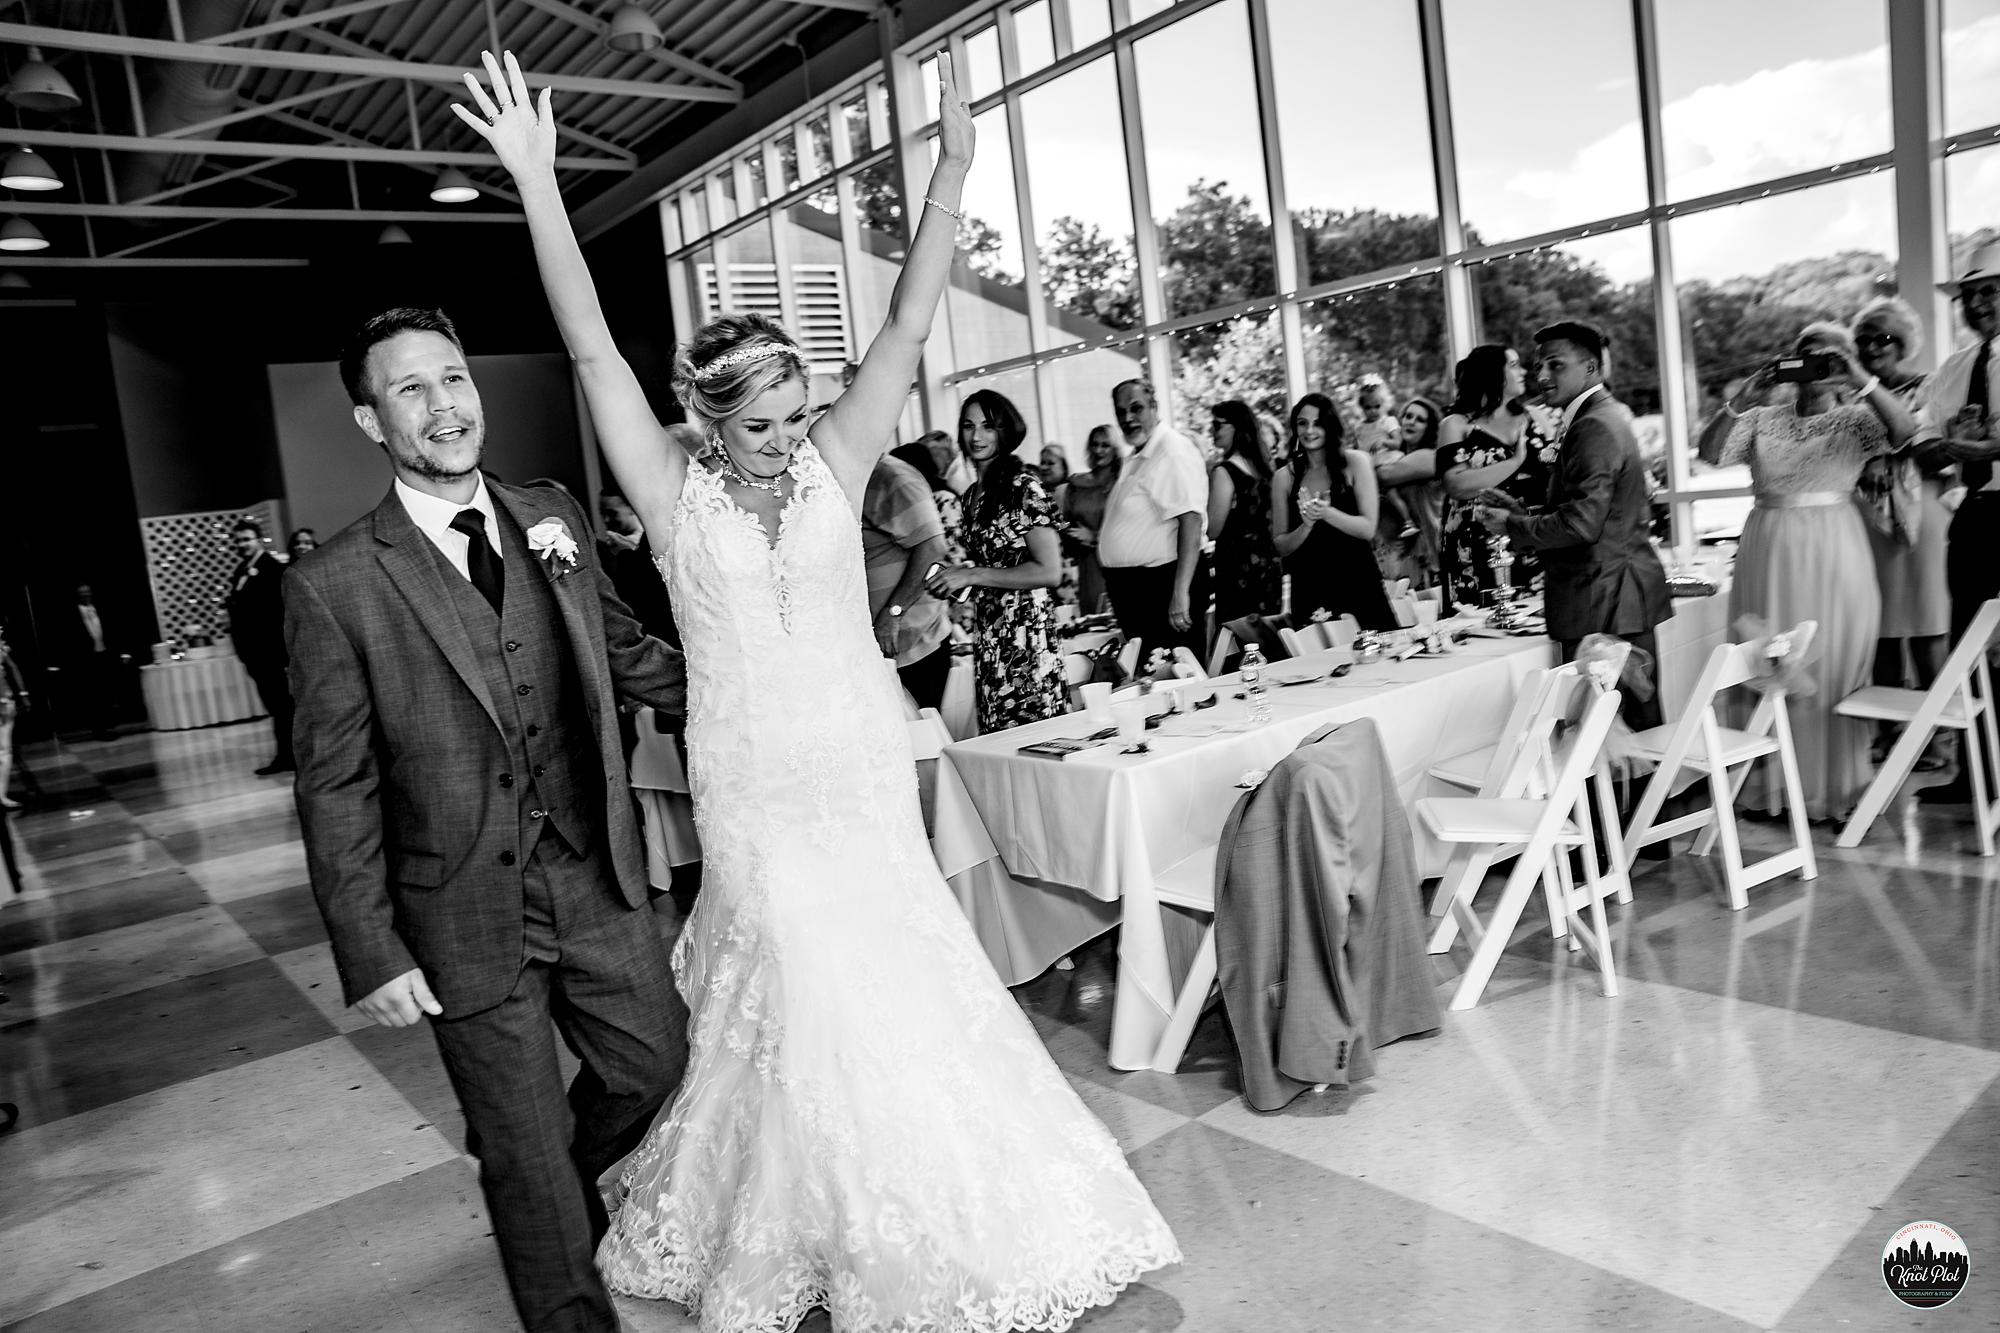 Southgate-Community-Center-KY-Wedding-Photography-20.jpg